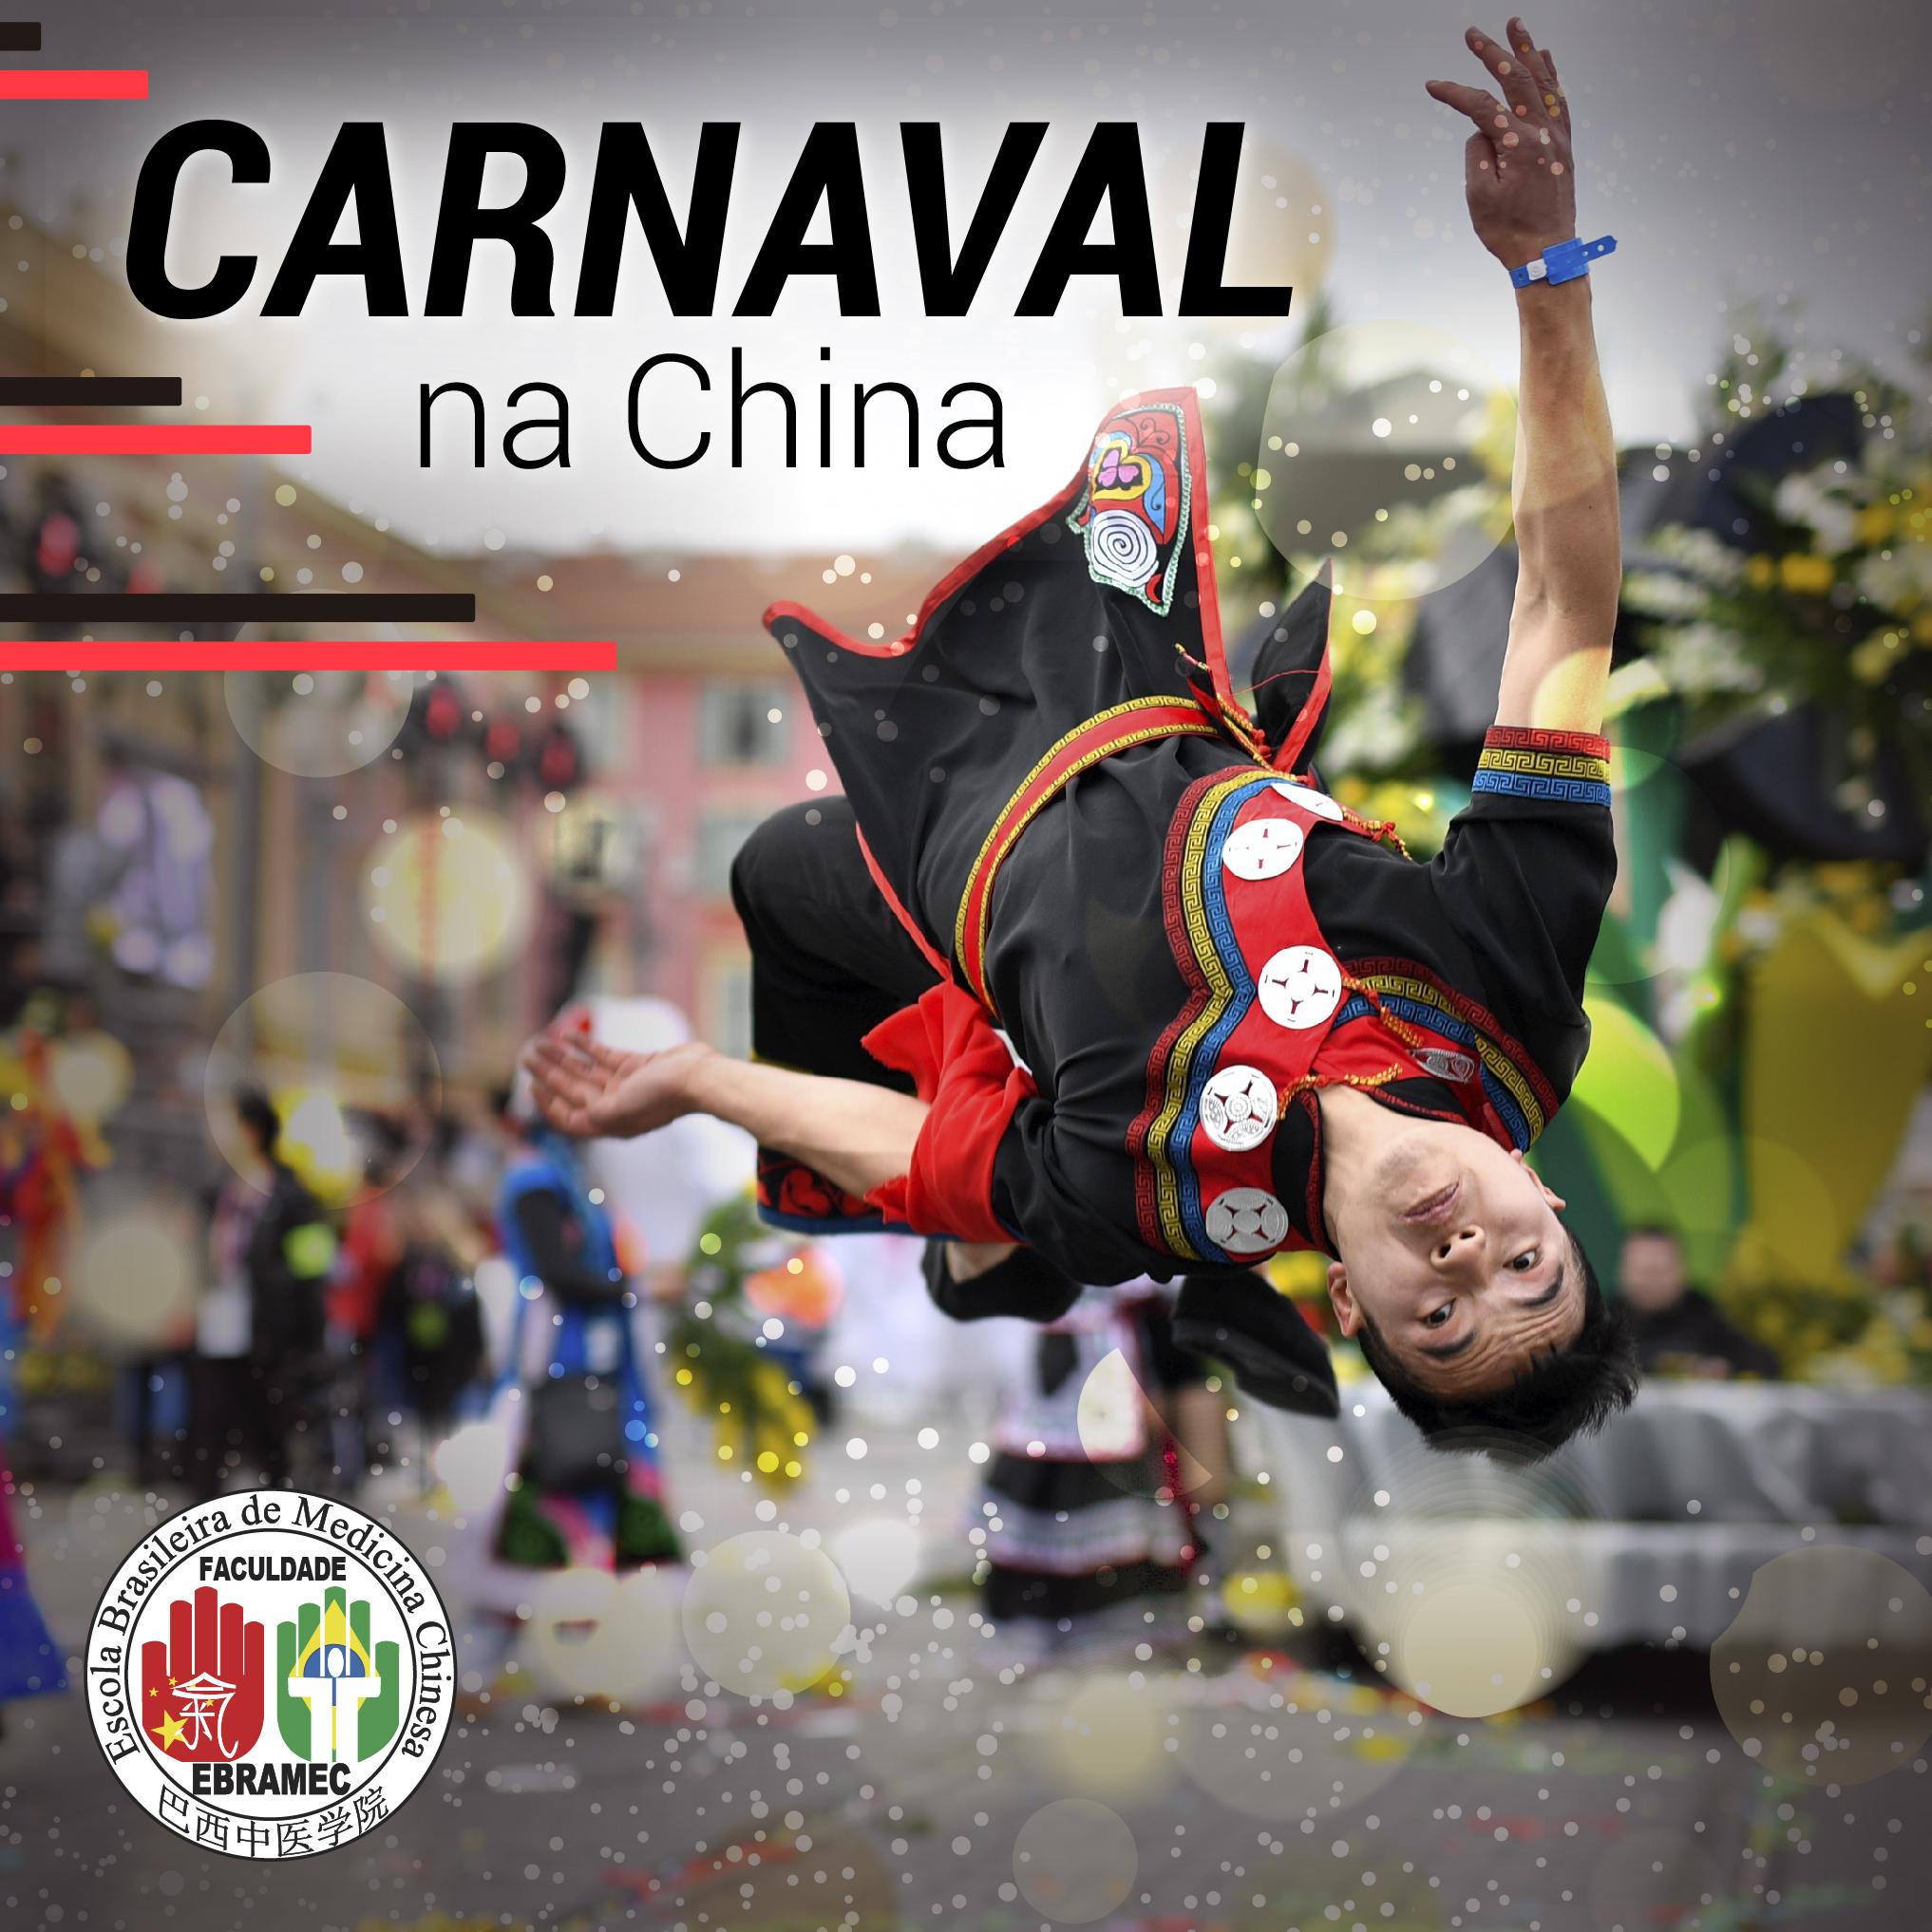 CARNAVALPrancheta-1@3x-100 Existe Carnaval na China?